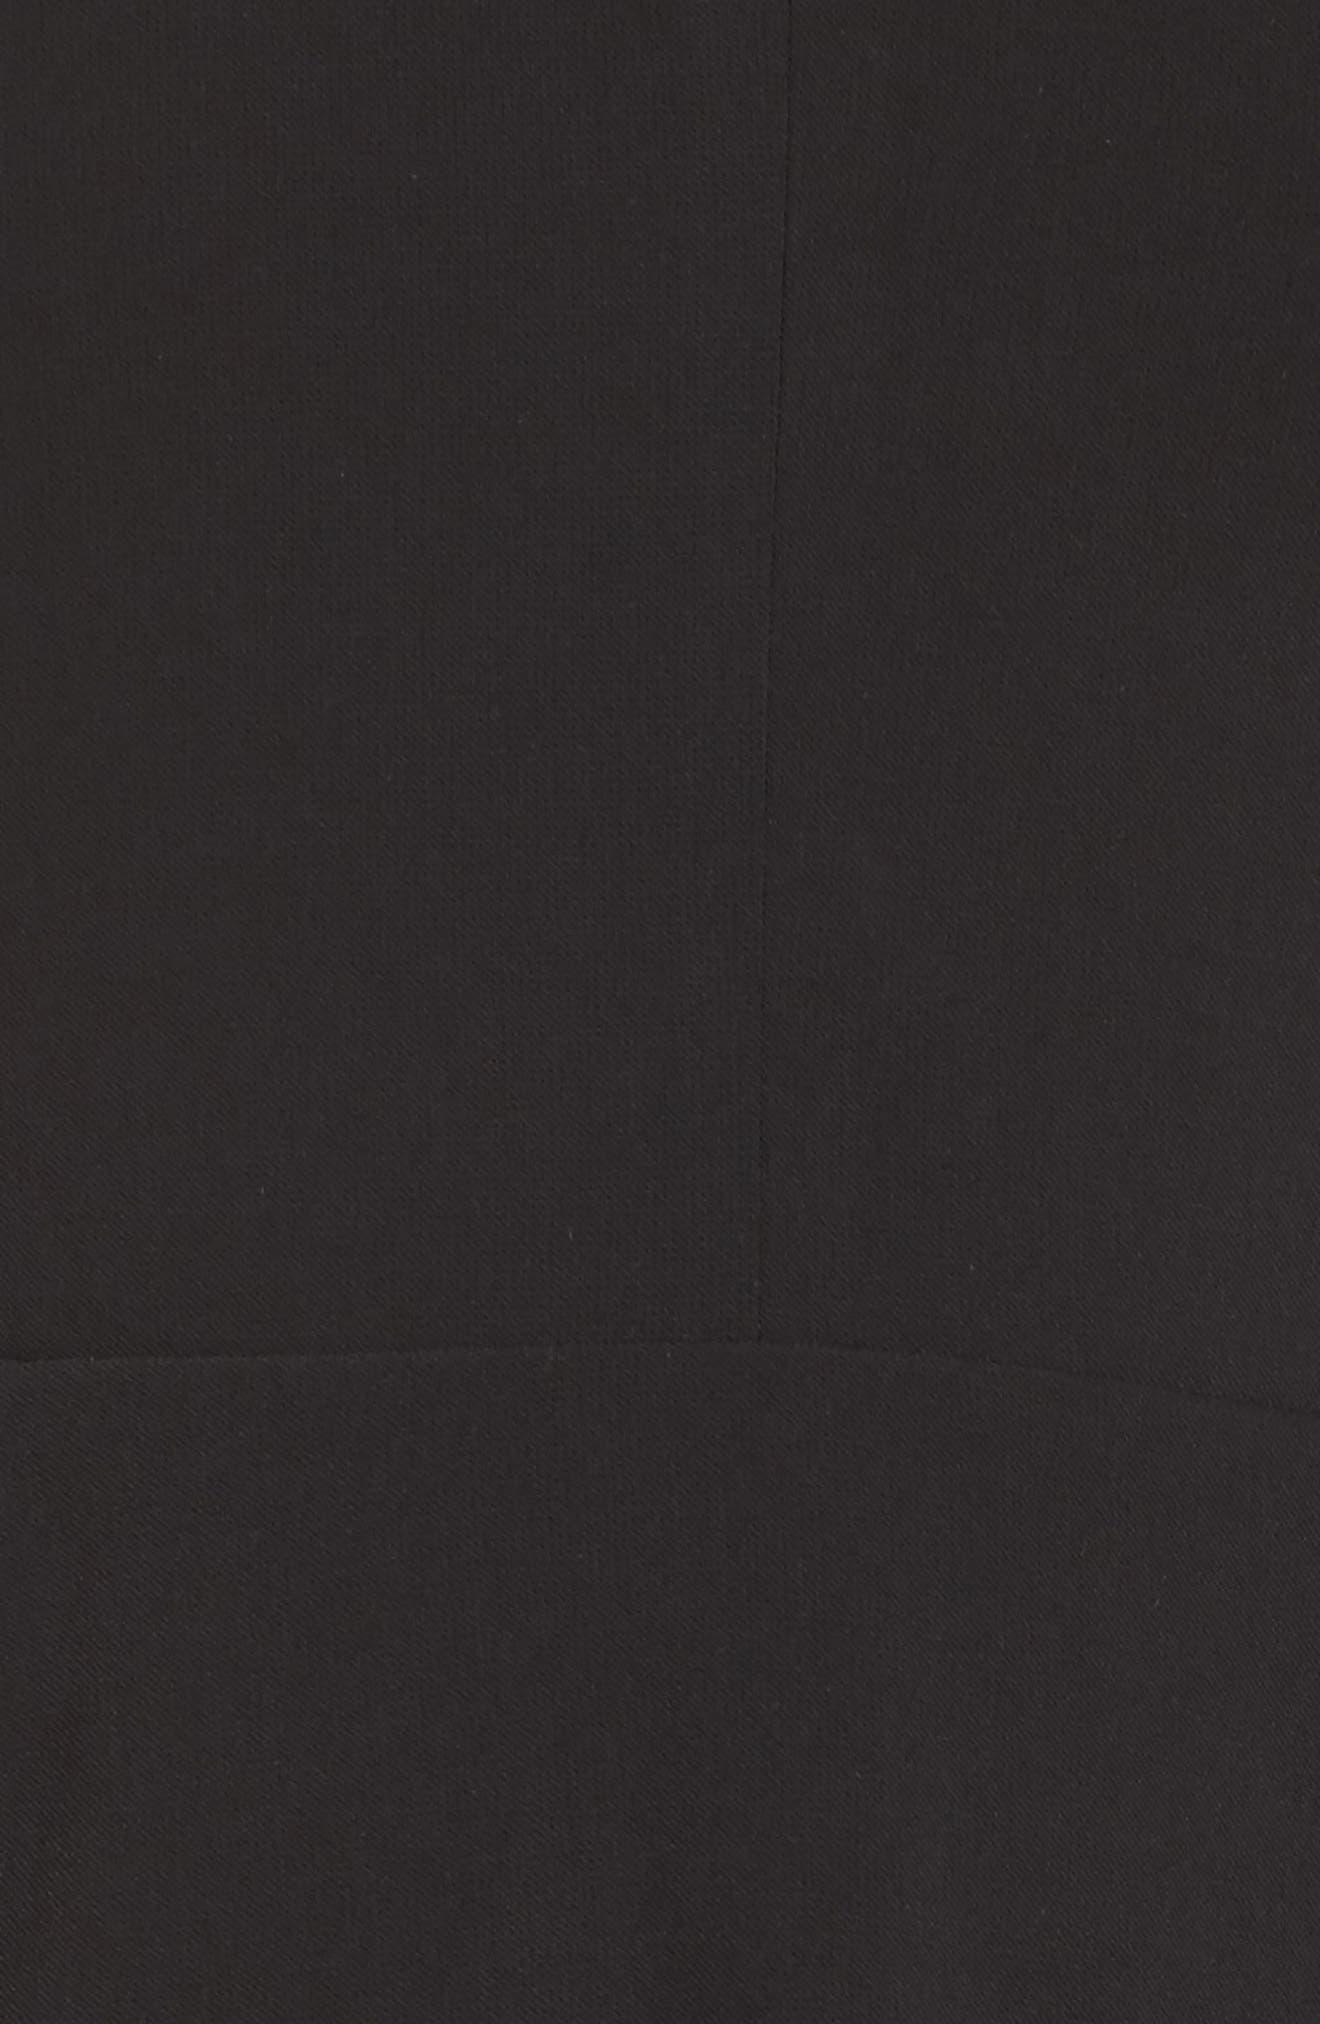 Zahara Cutout Fit & Flare Dress,                             Alternate thumbnail 5, color,                             Black